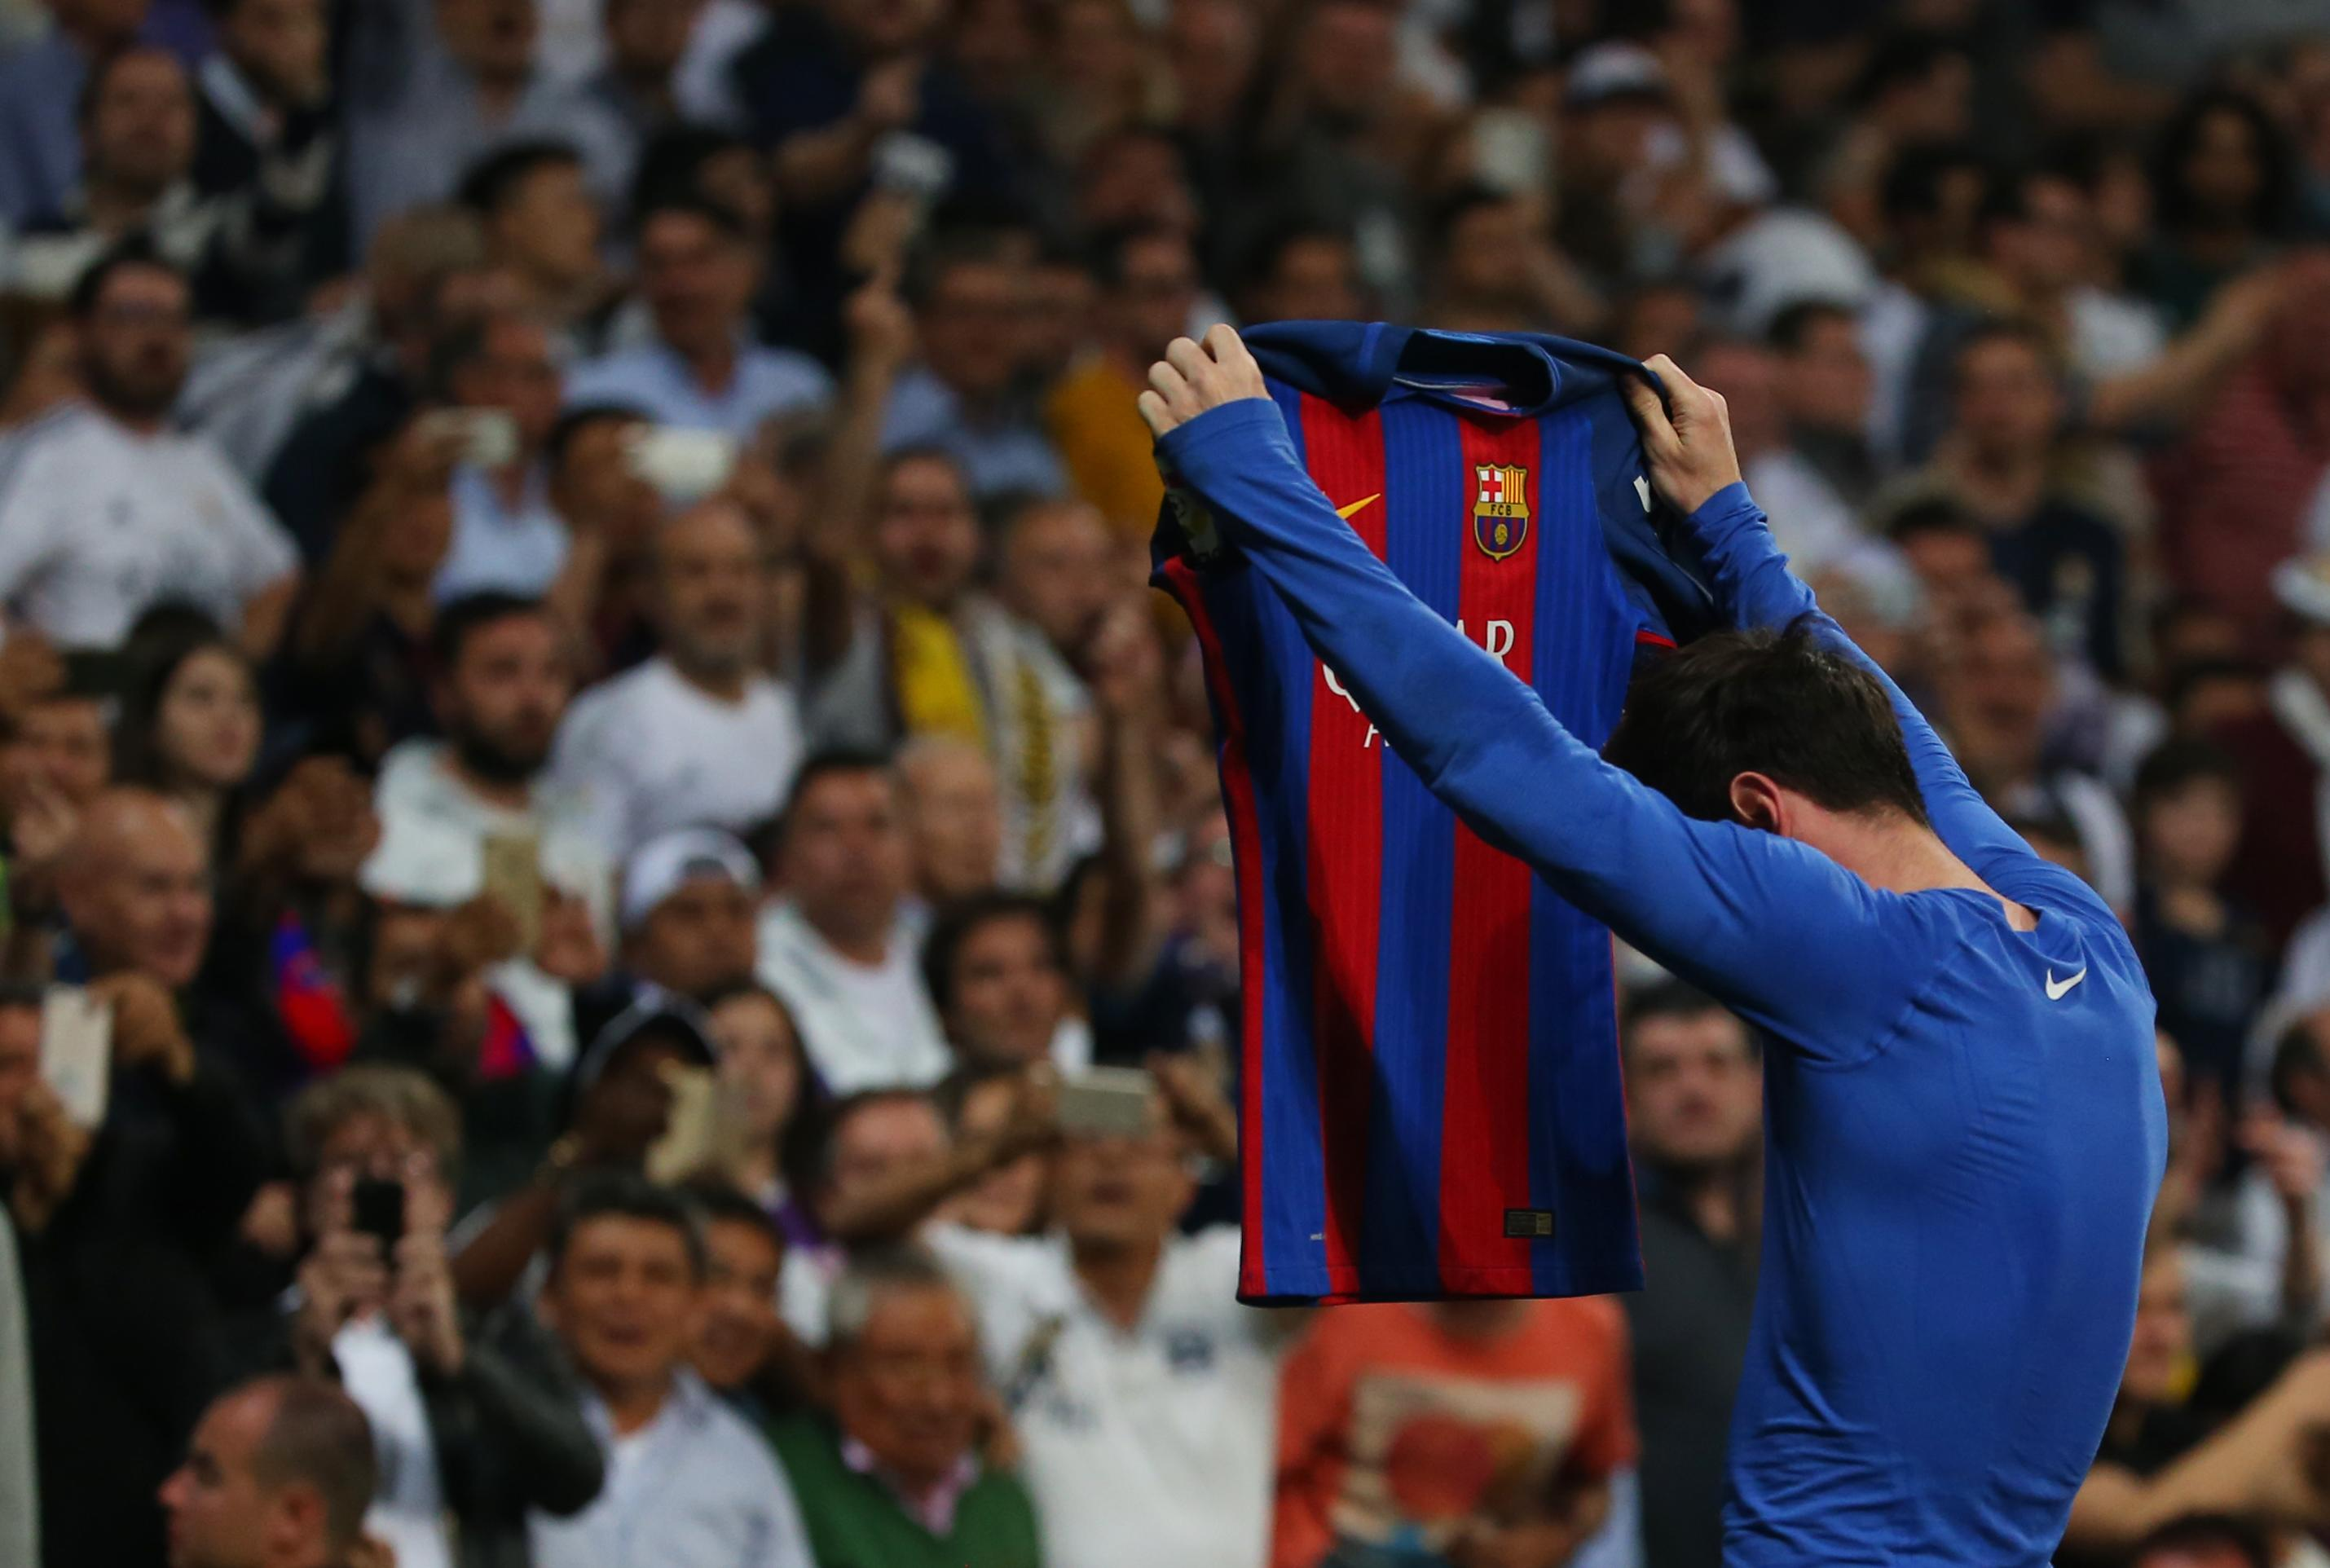 Lionel Messi's Landmark Goals: A Look Back at the Footballer